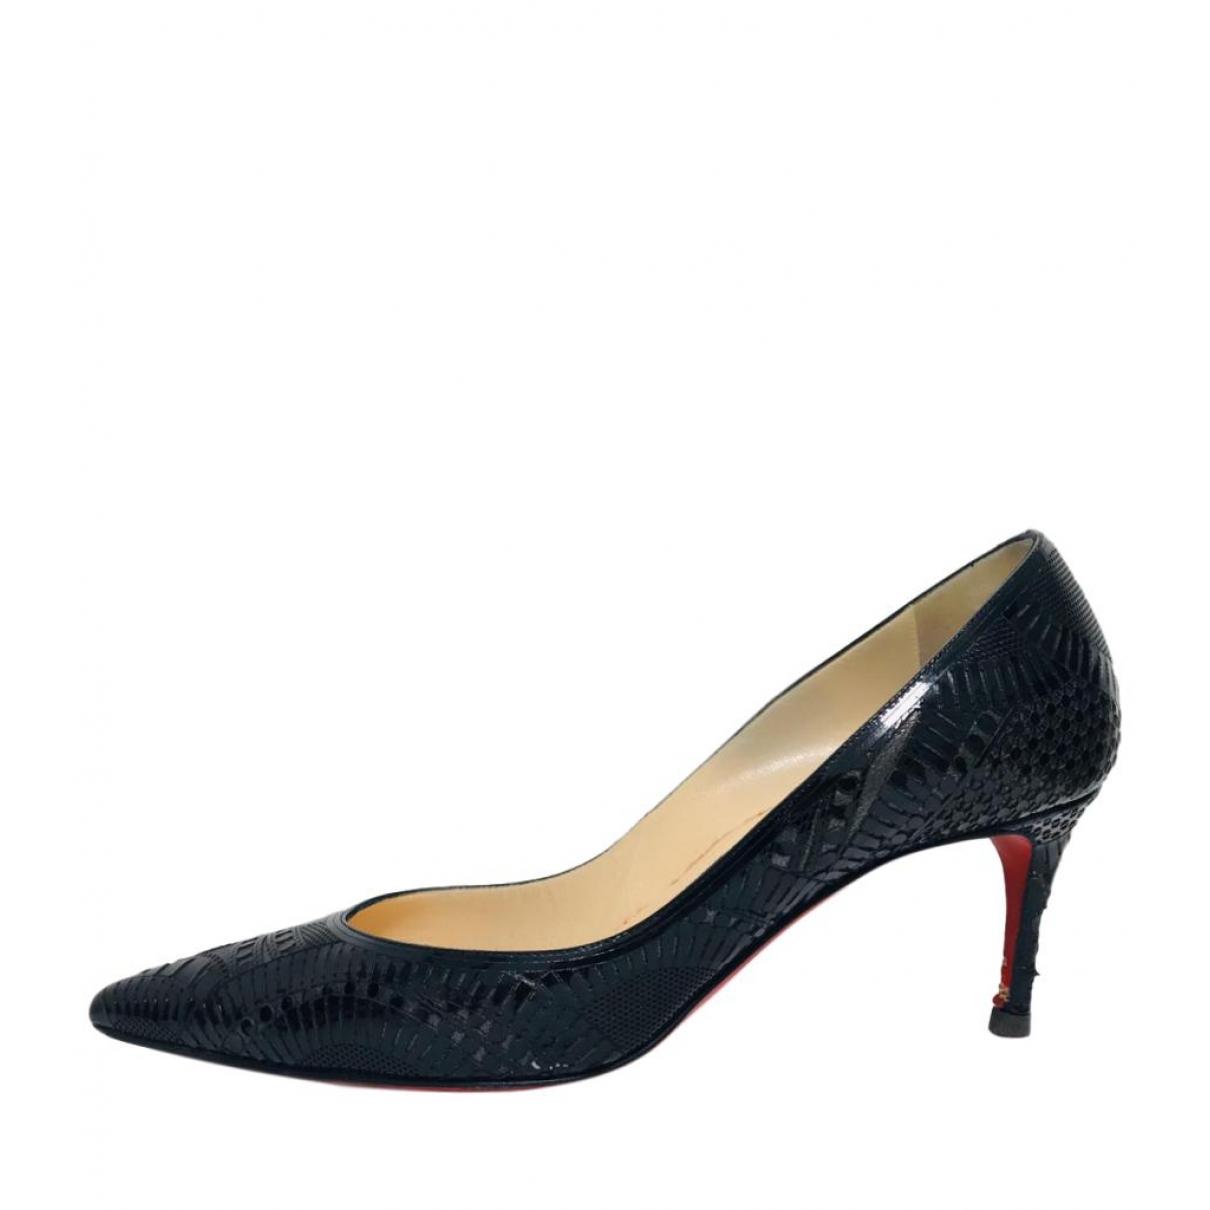 Christian Louboutin \N Black Leather Heels for Women 38.5 EU